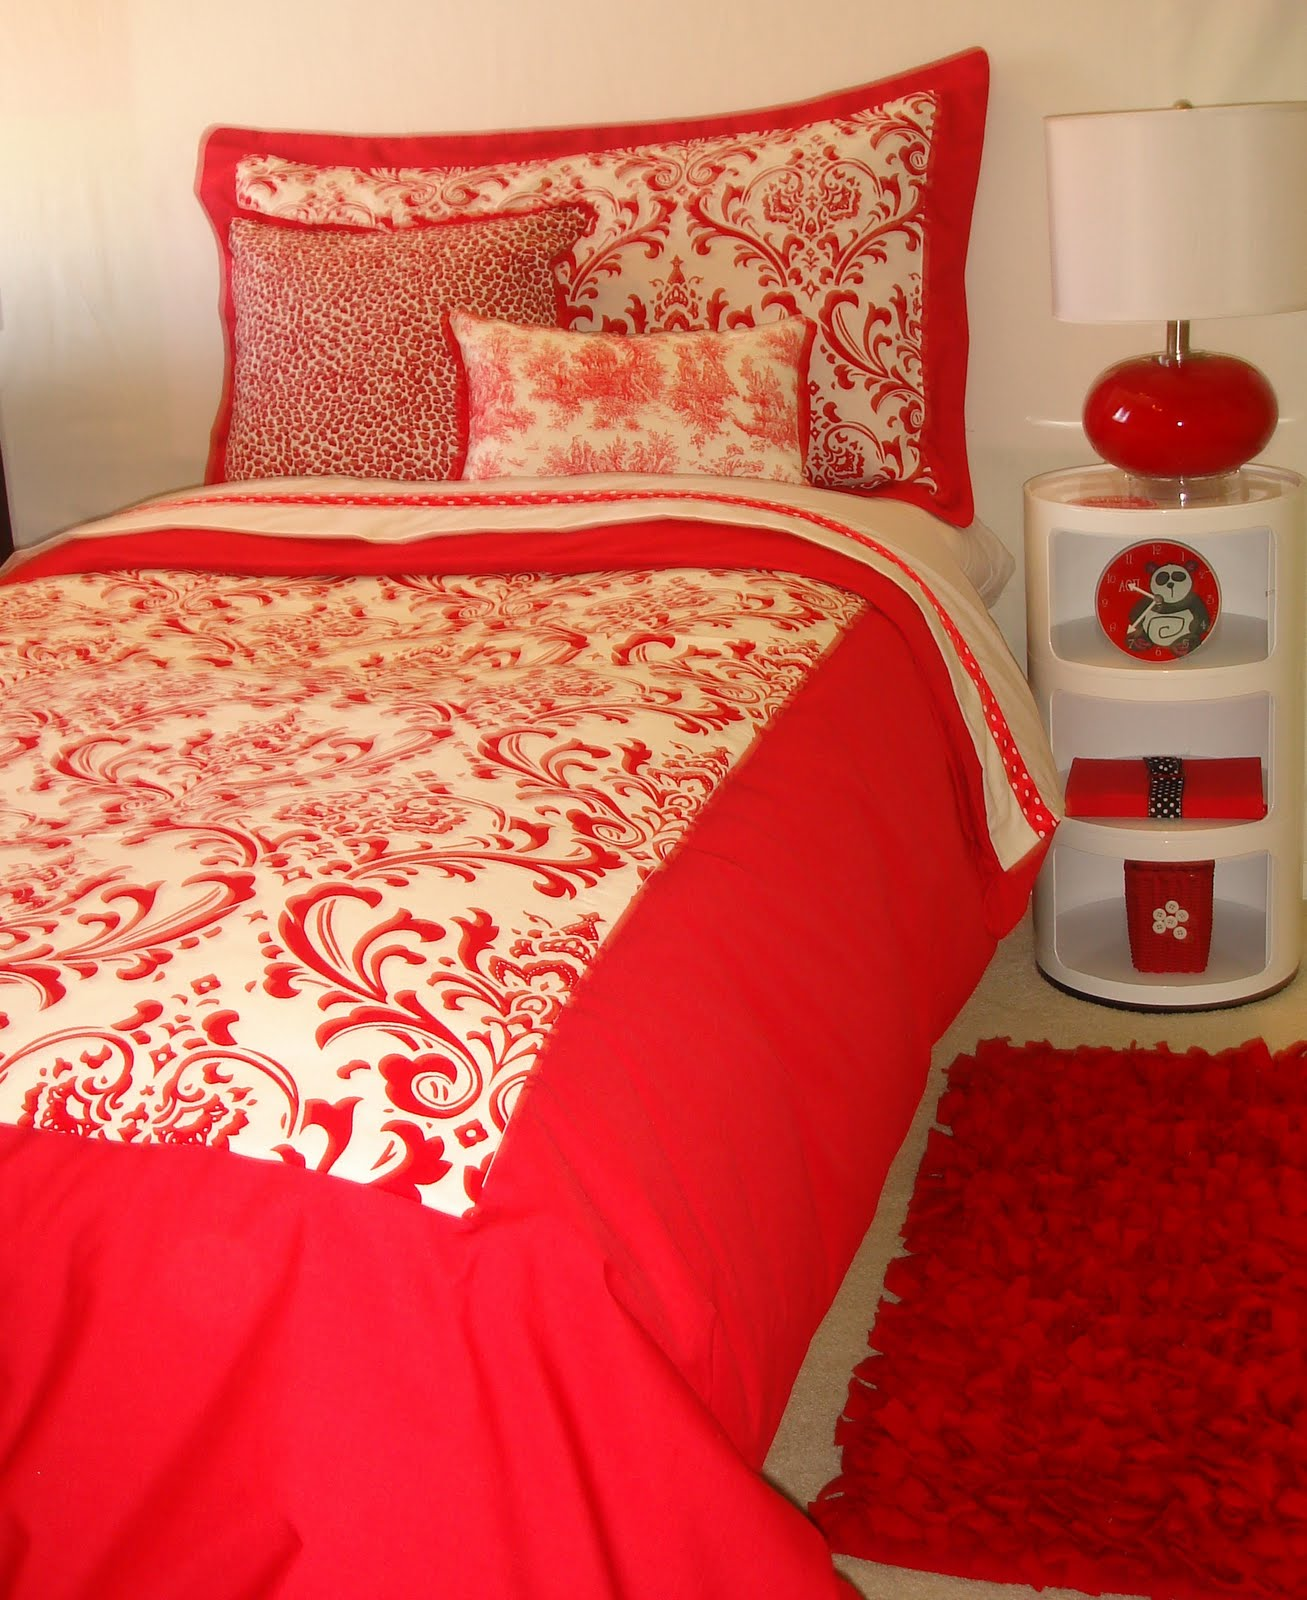 Home Design Ideas Construction: Decor 2 Ur Door: Dorm Bedding Ideas